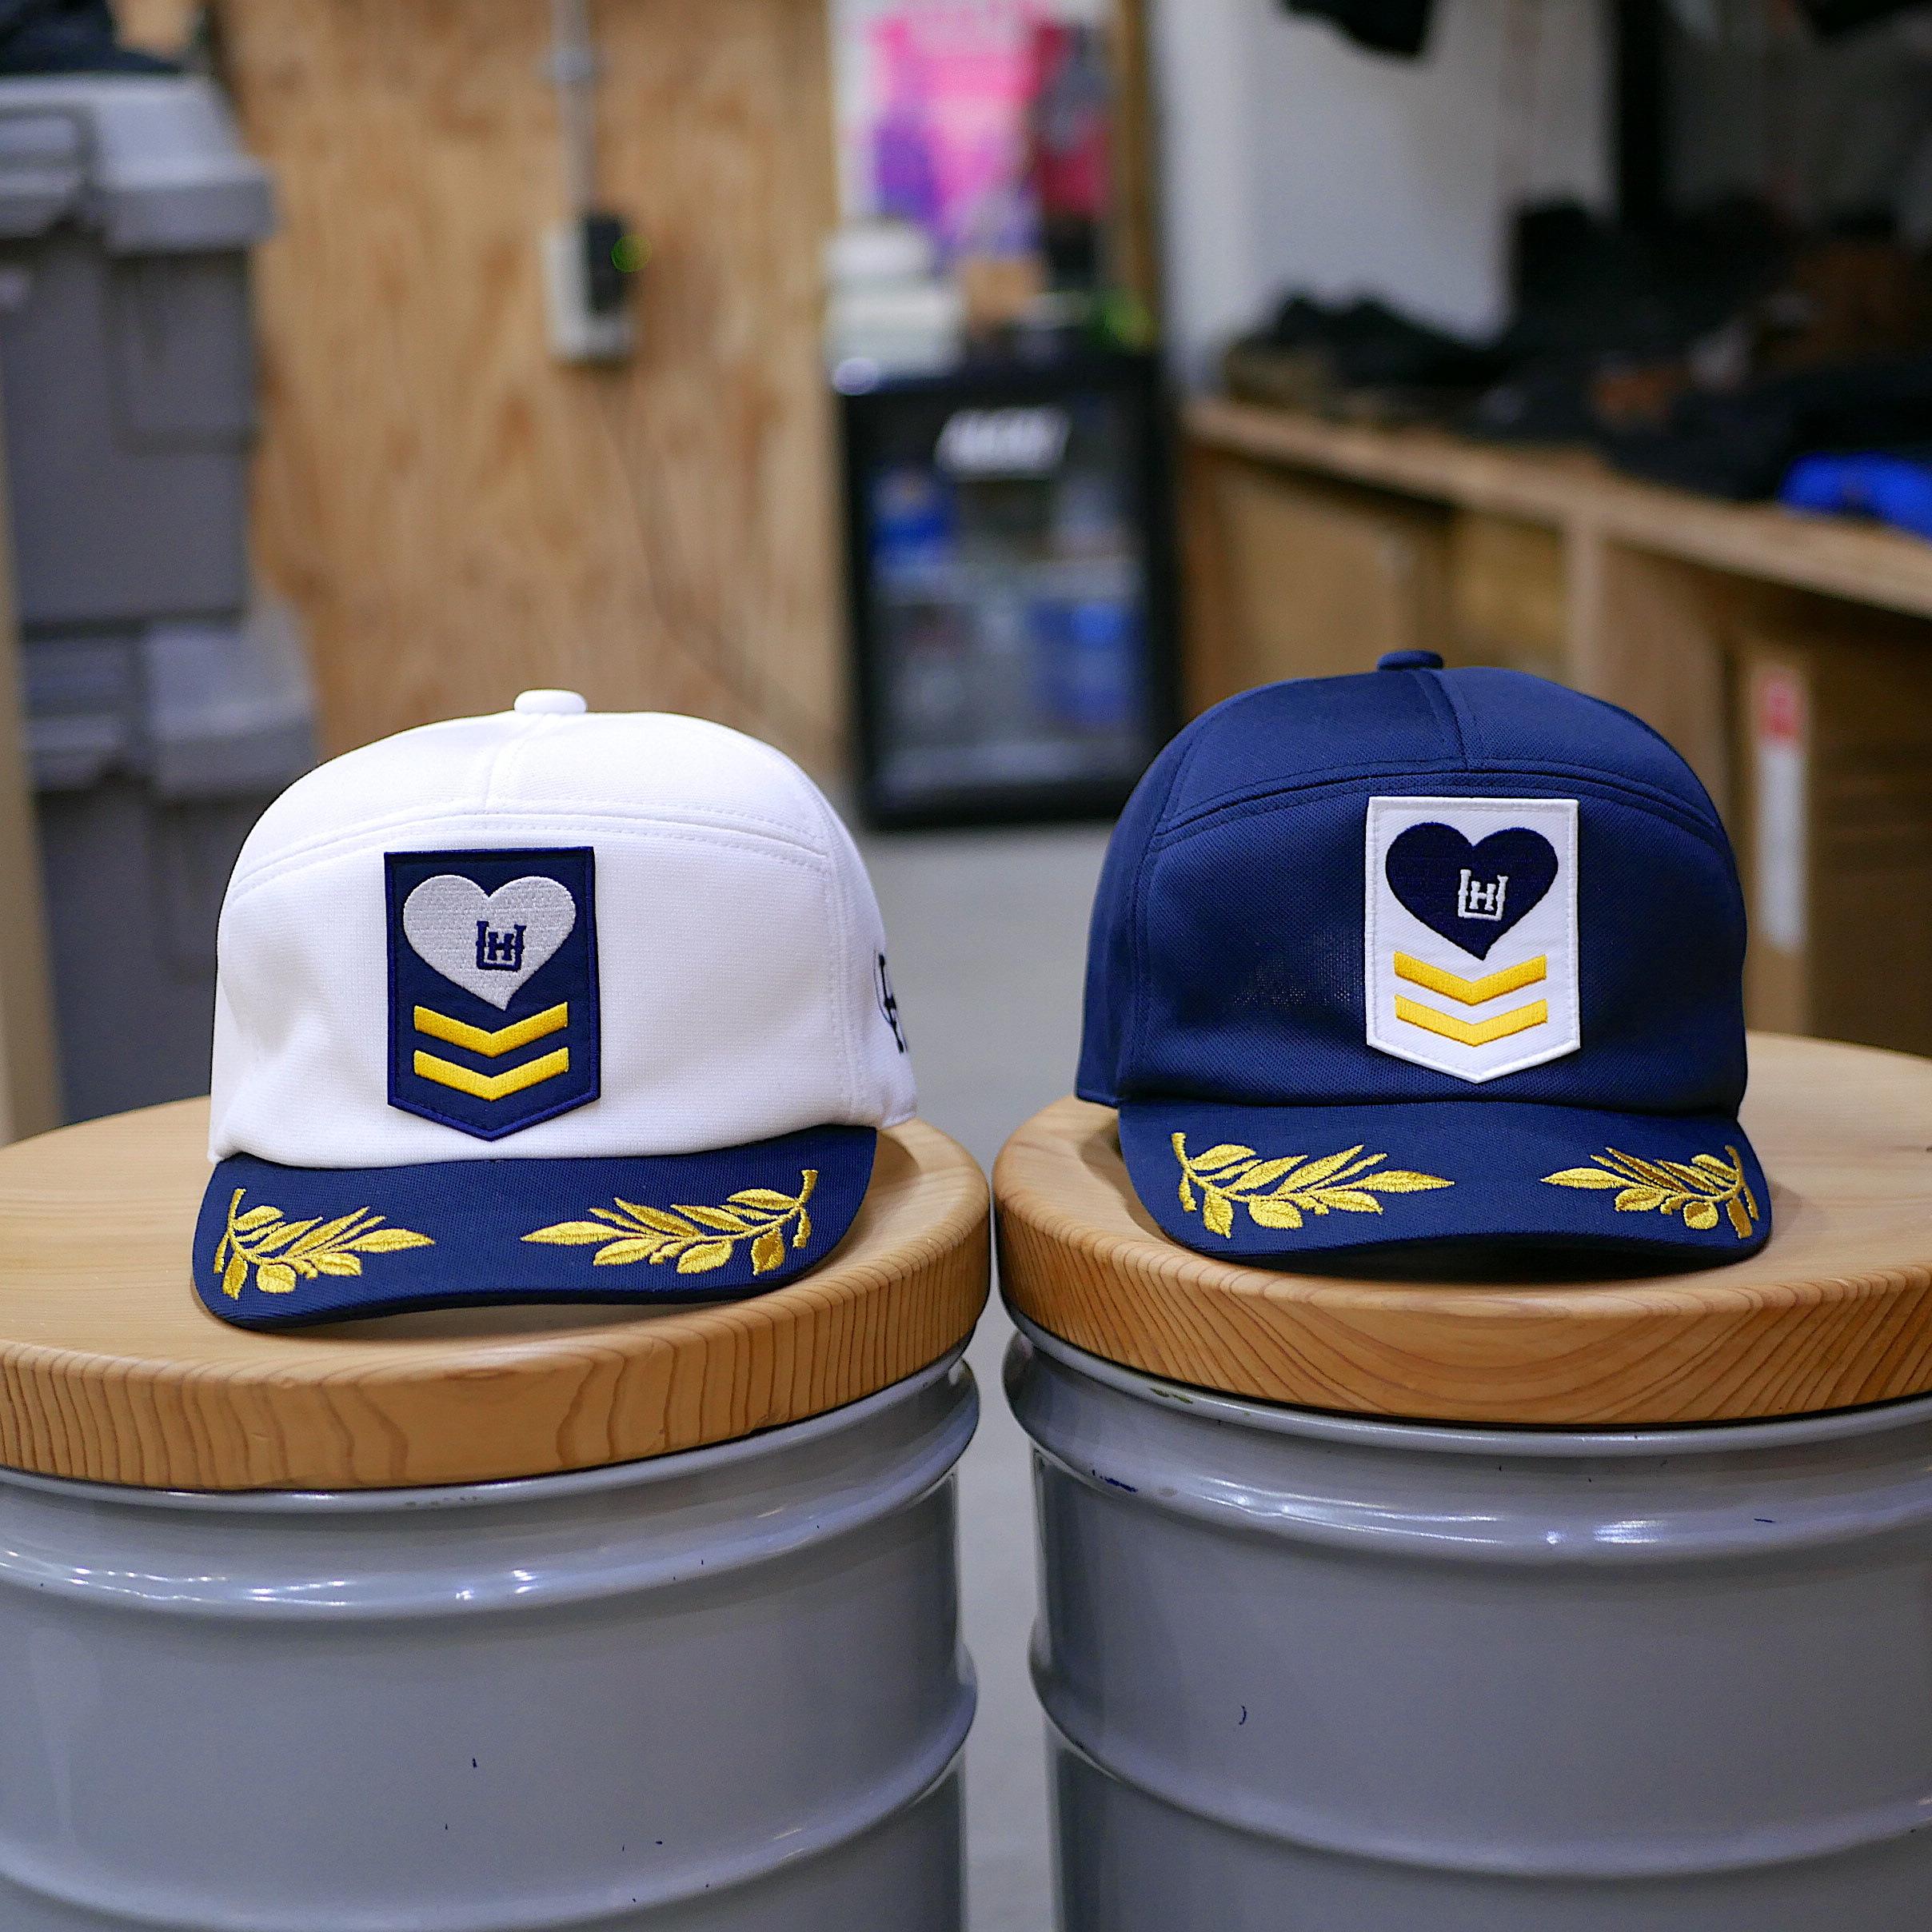 U.H × どら猫帽子店 / アポロキャップ